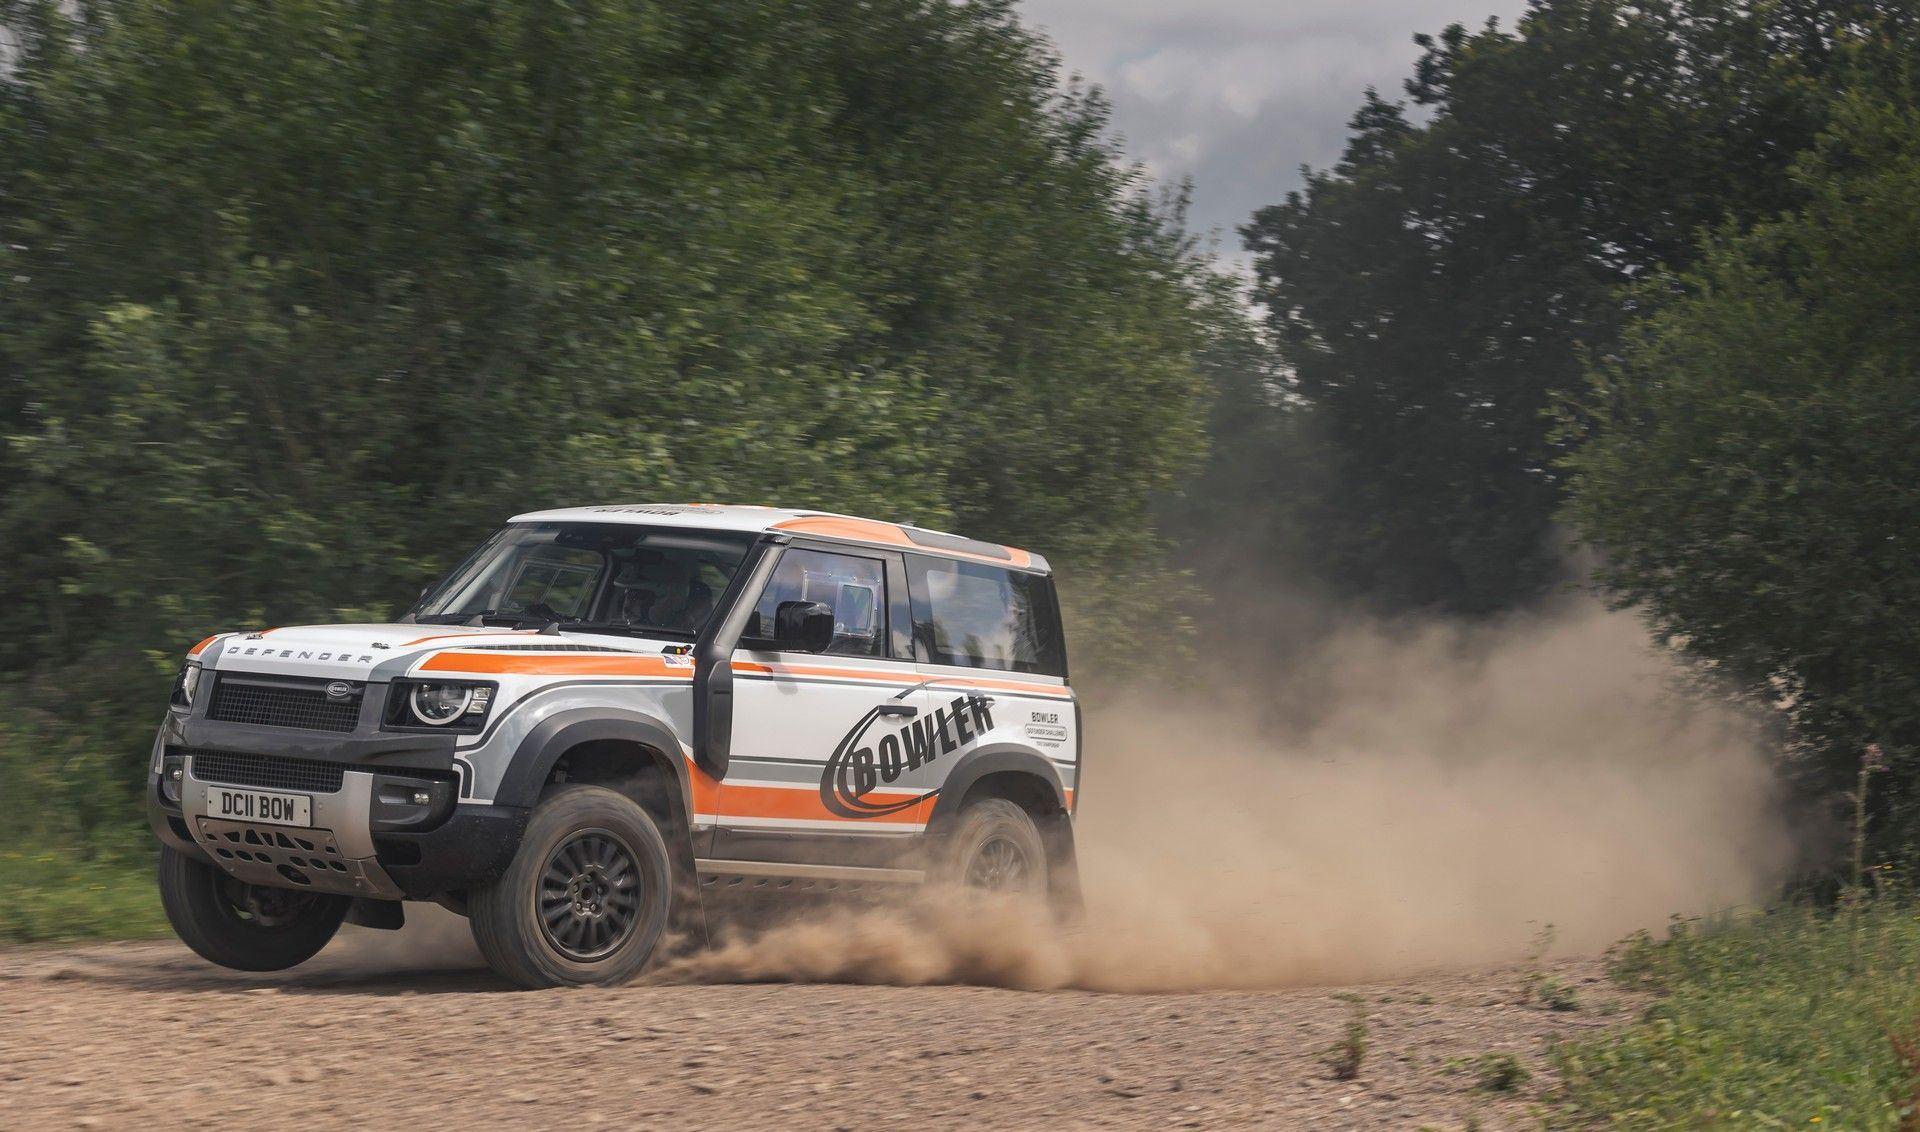 Bowler-Land-Rover-Defender-Challenge-Rally-Car-21